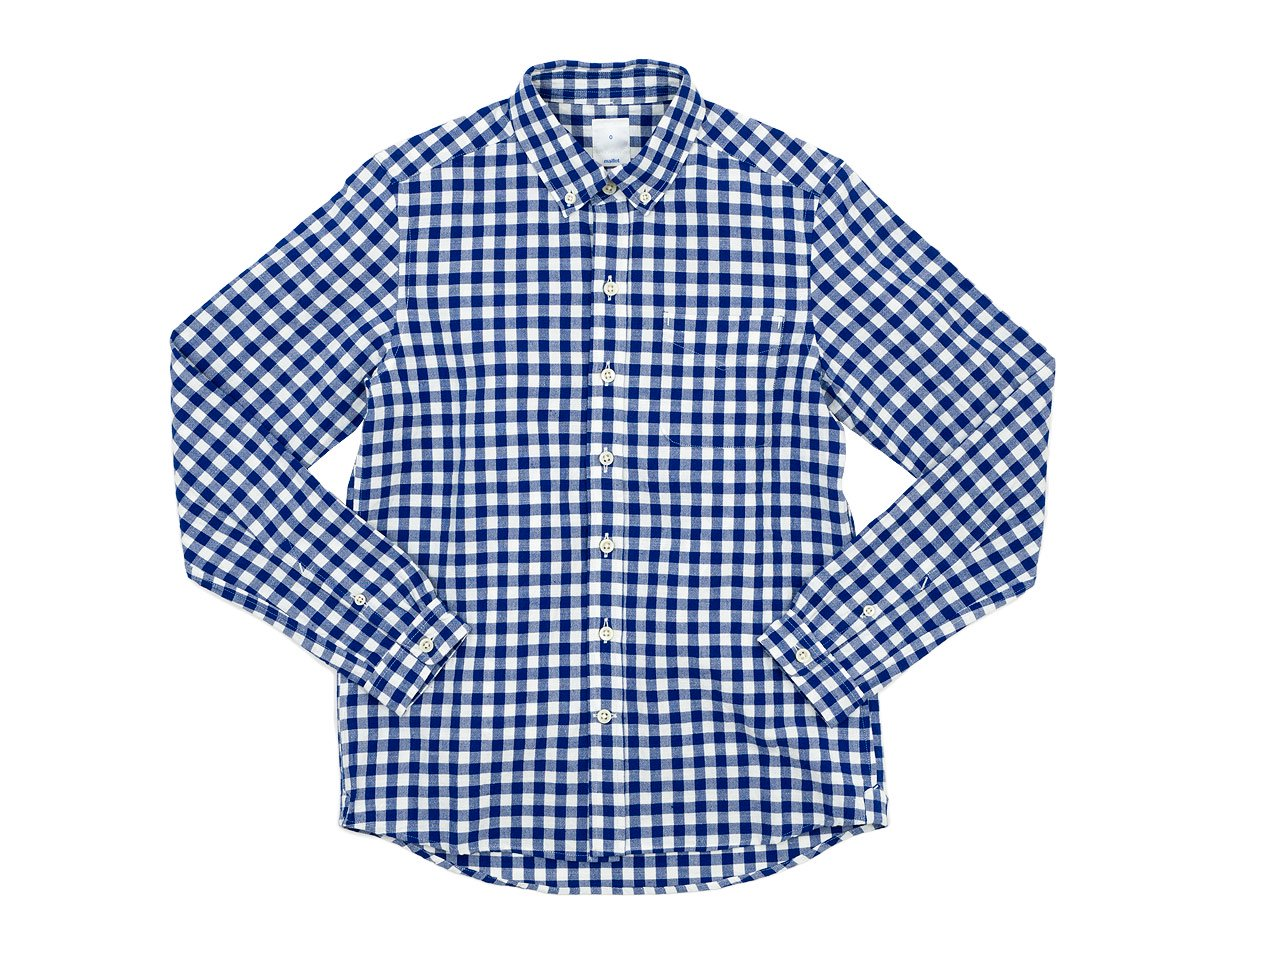 maillot sunset big gingham B.D. shirts BIG BLUE x WHITE